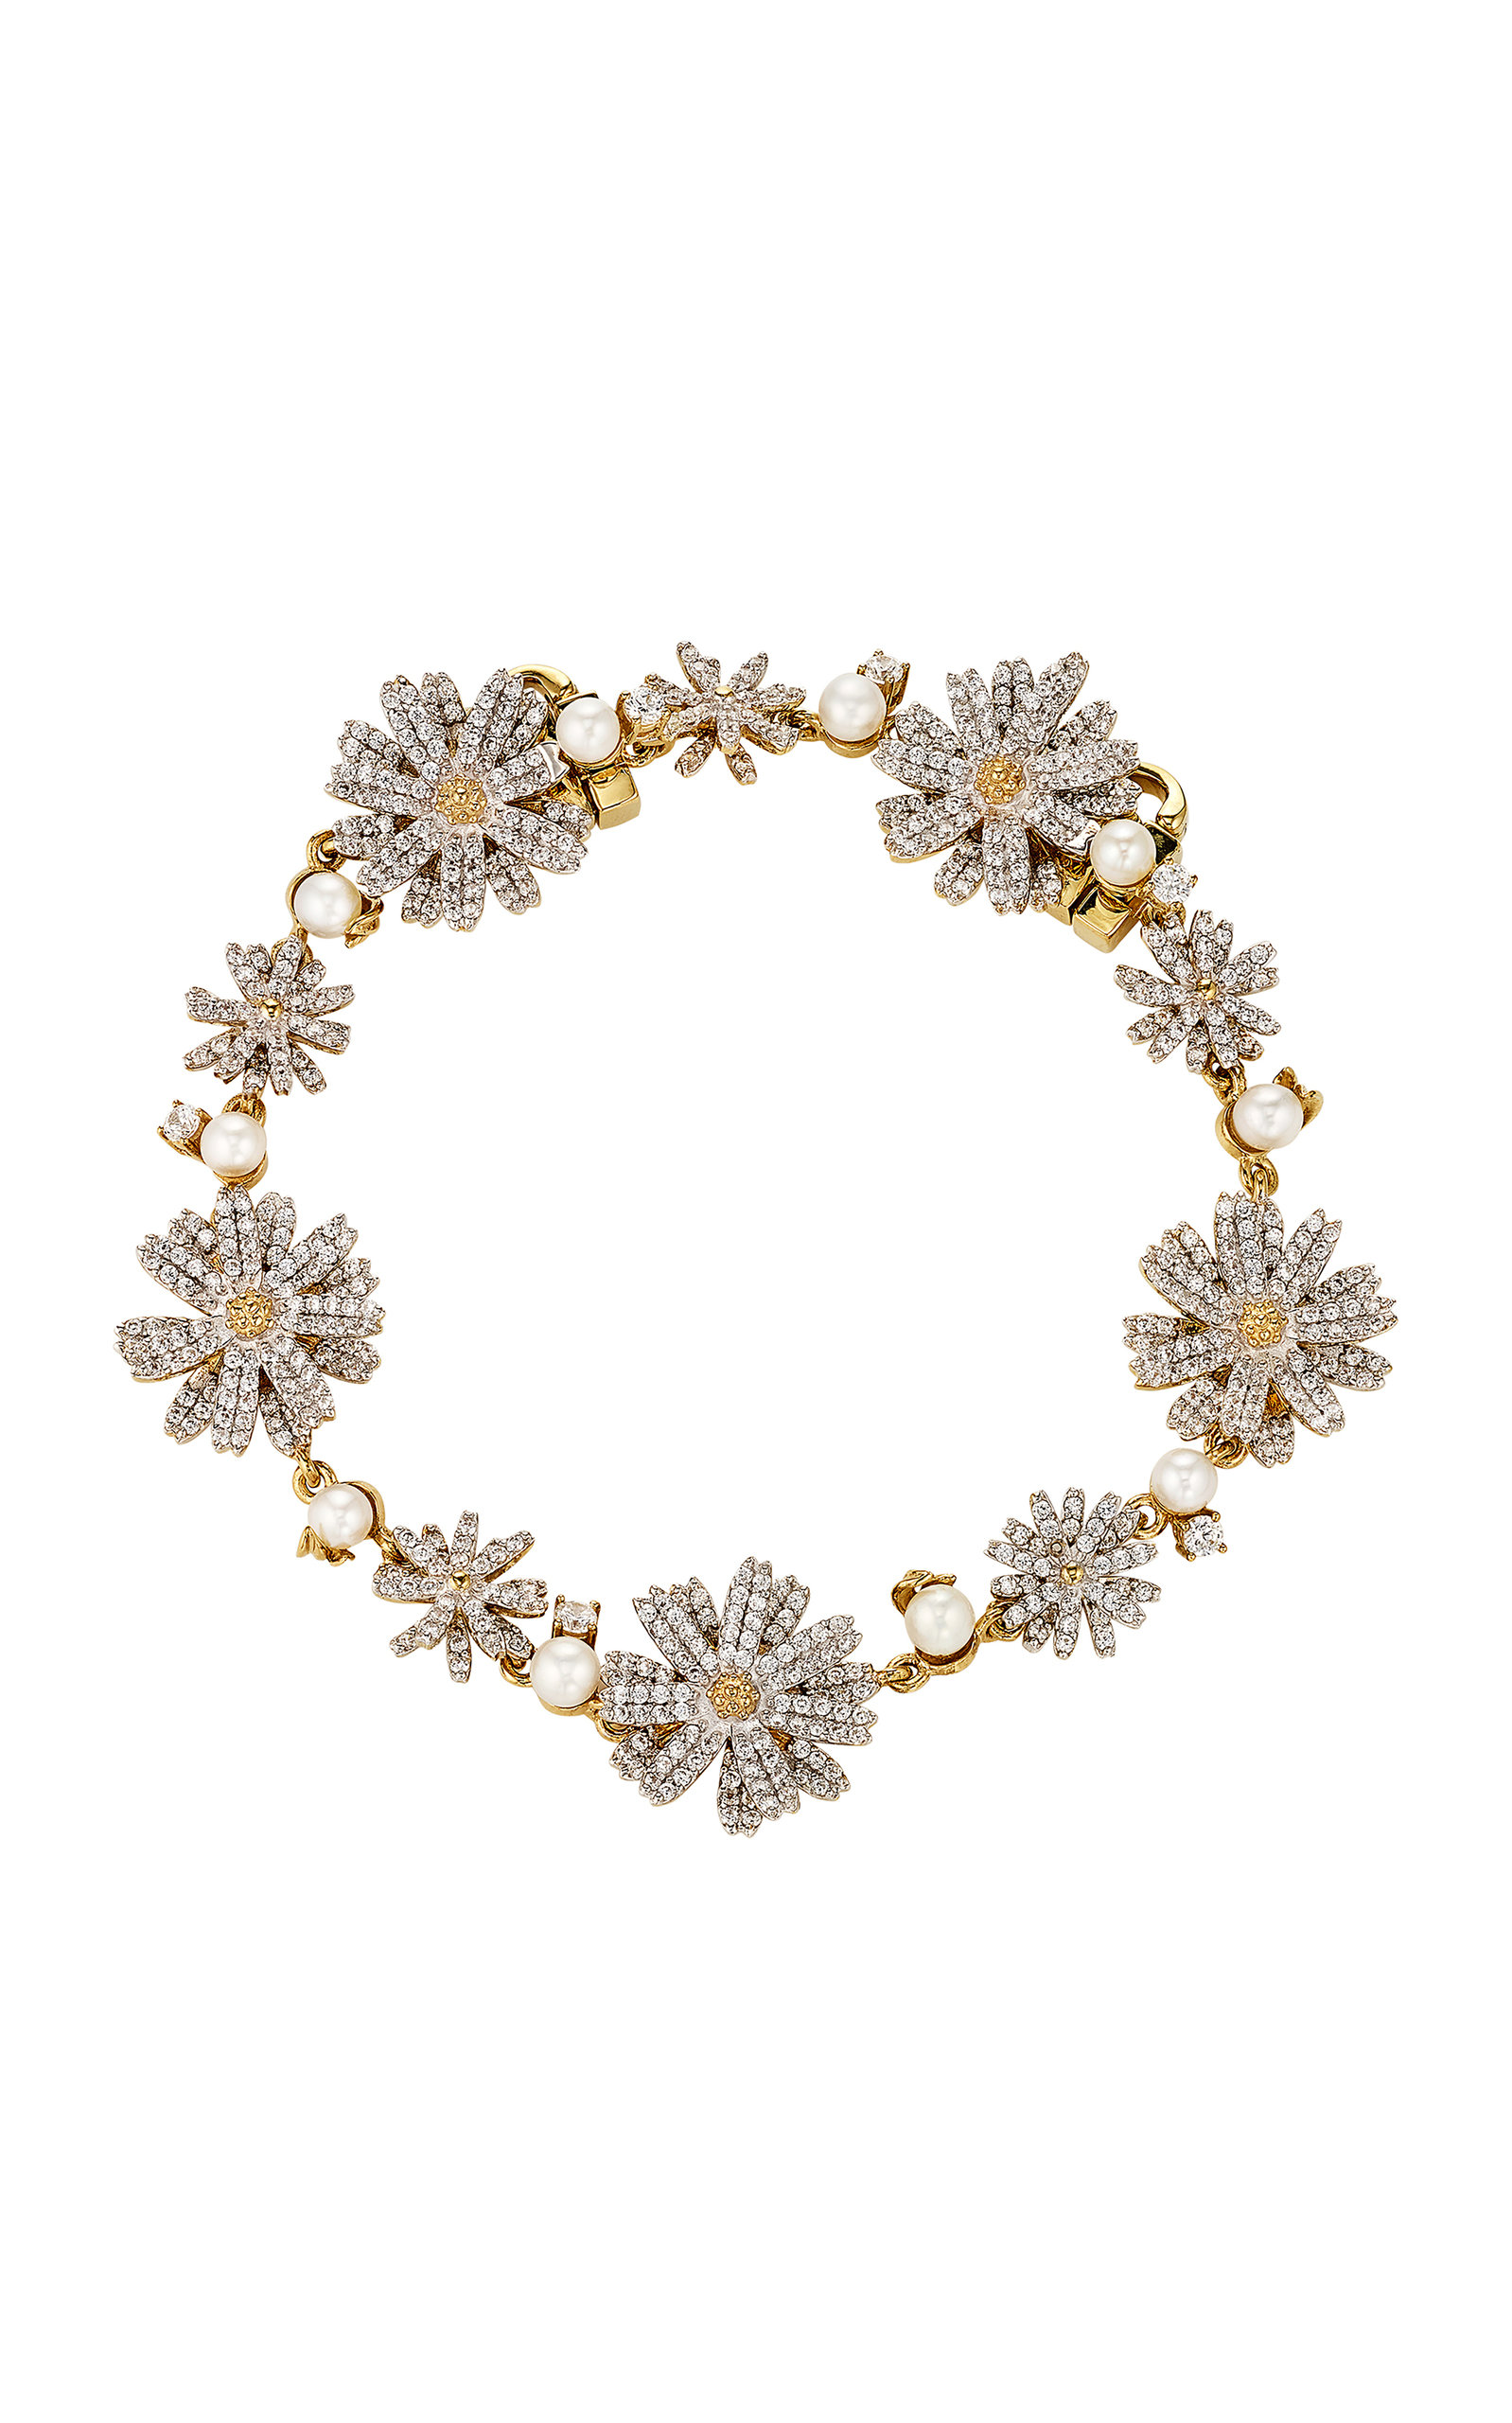 Women's 18K Gold Vermeil; Diamond And Pearl Bracelet